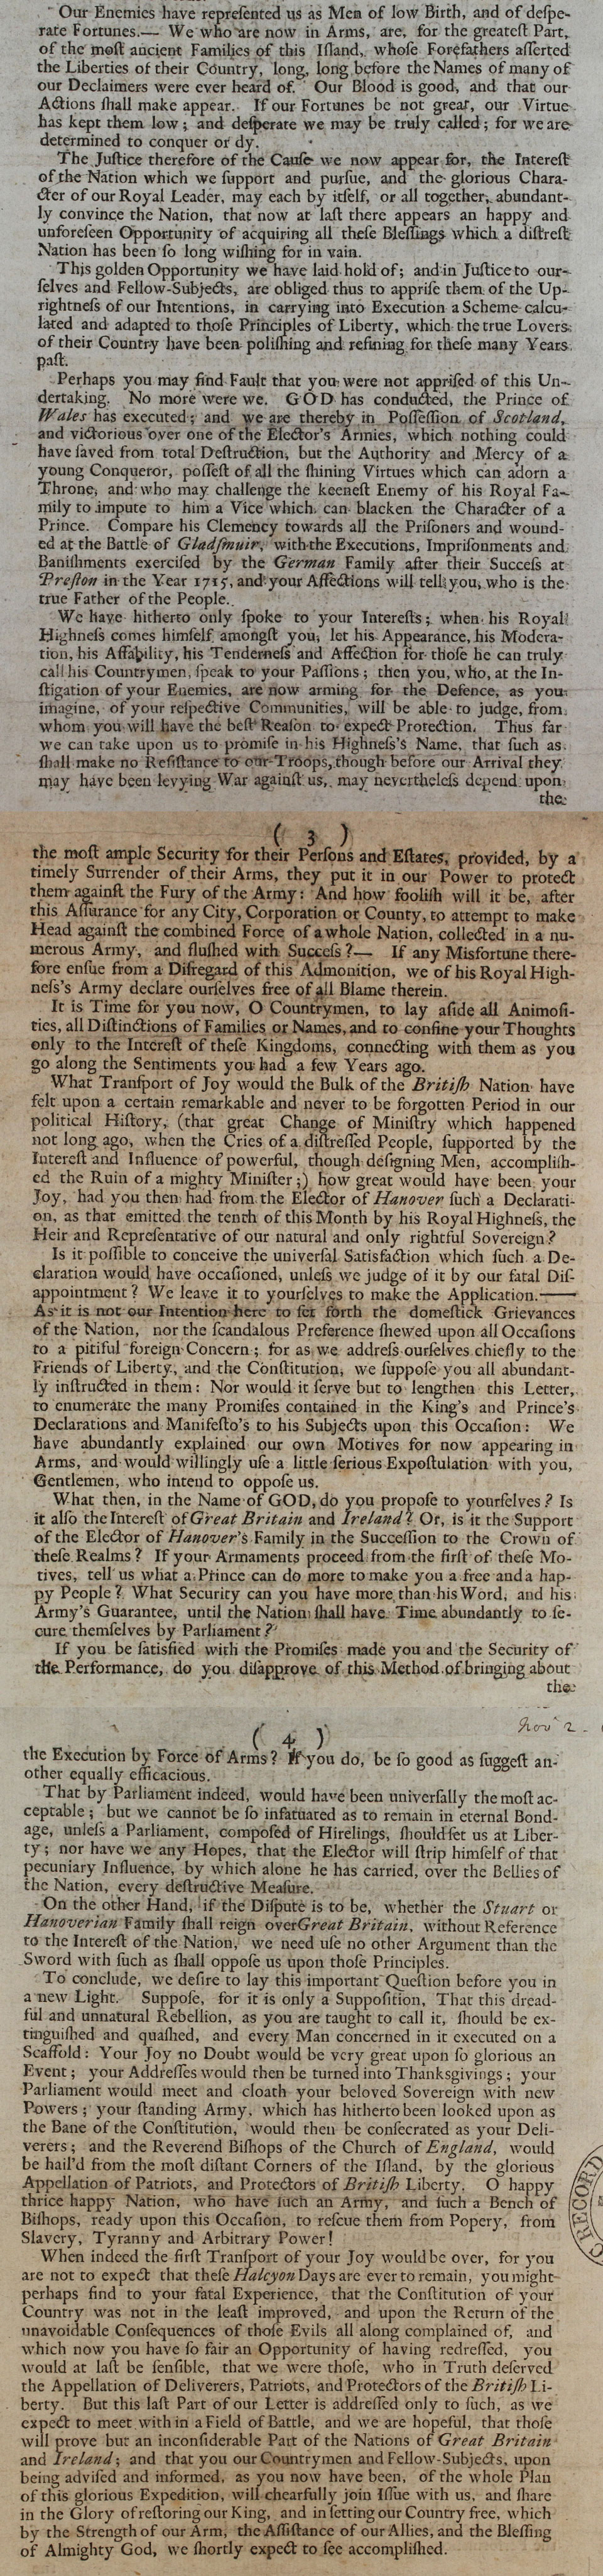 Letter from Charles Edward Stuart, 1745 (SP 54/26 /72D)